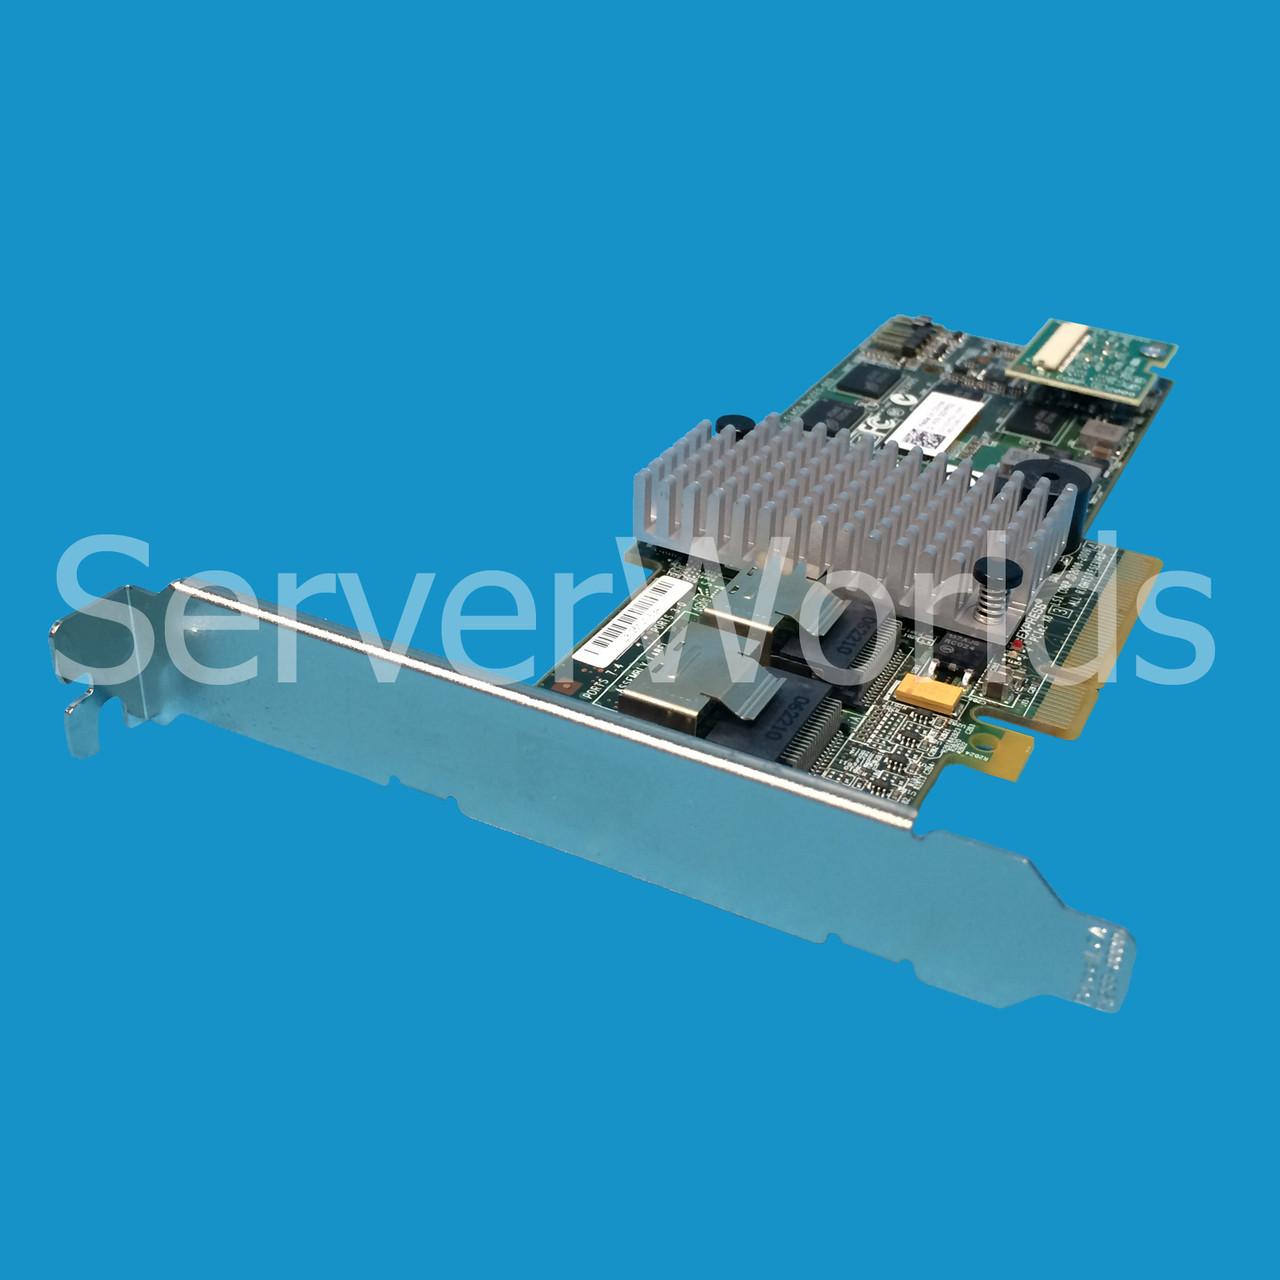 Dell DYF52   LSI 9260 8I Mega Raid Controller - Serverworlds